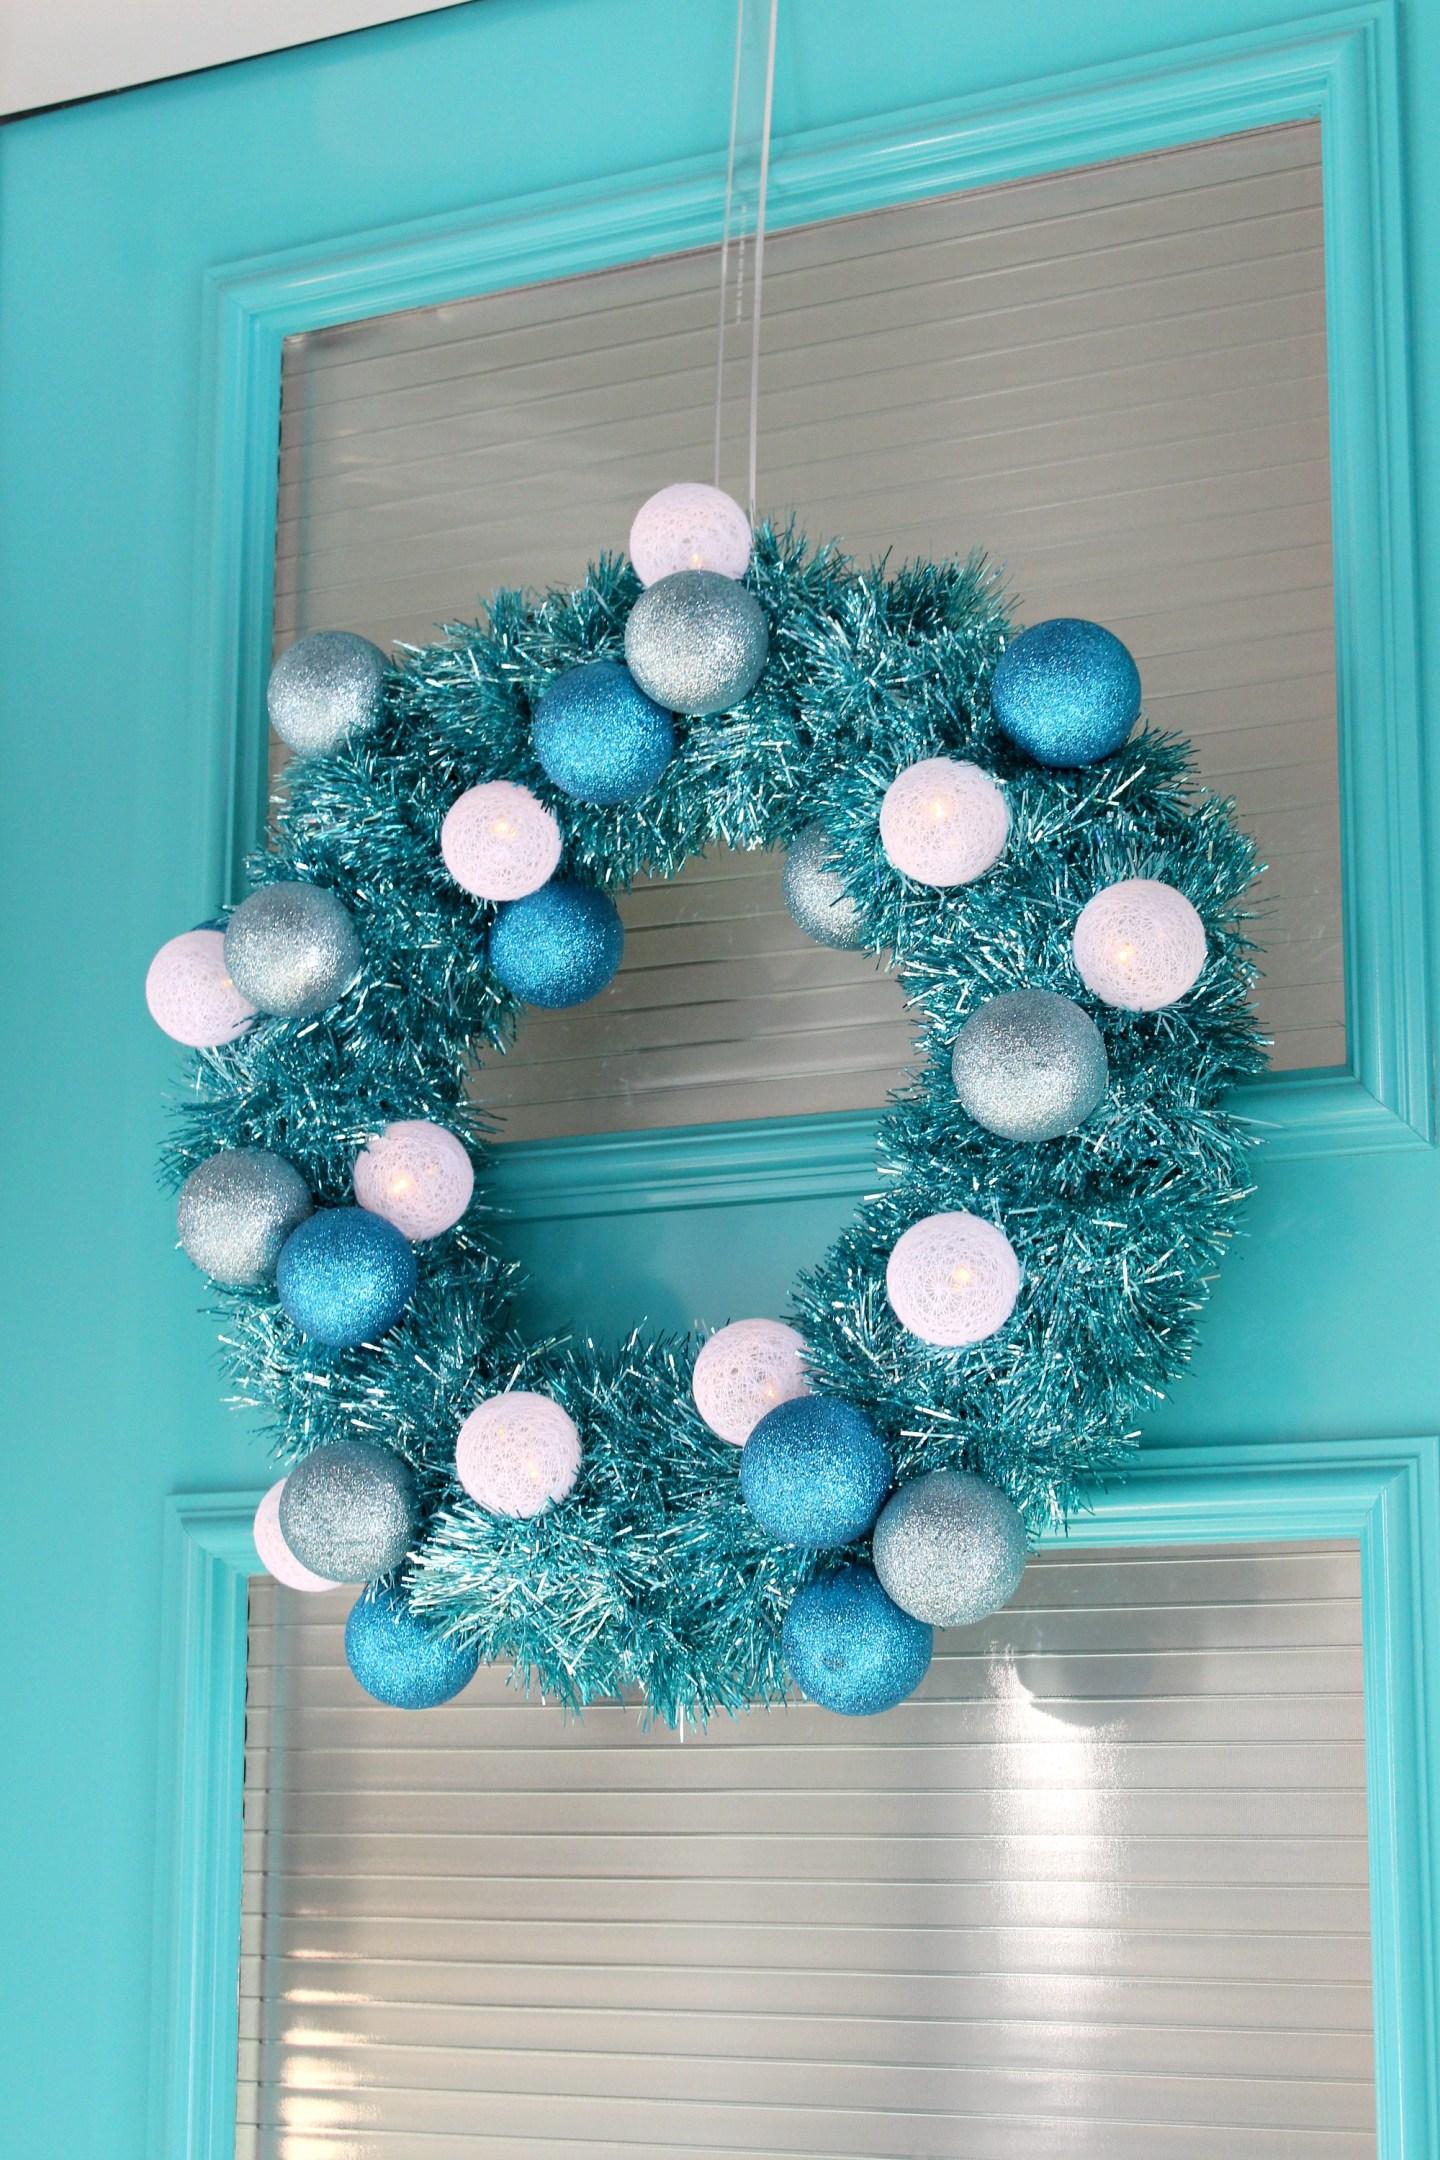 DIY Tinsel Wreath with Retro Vibes #diychristmas #tinsel #tinselwreath #retrochristmas